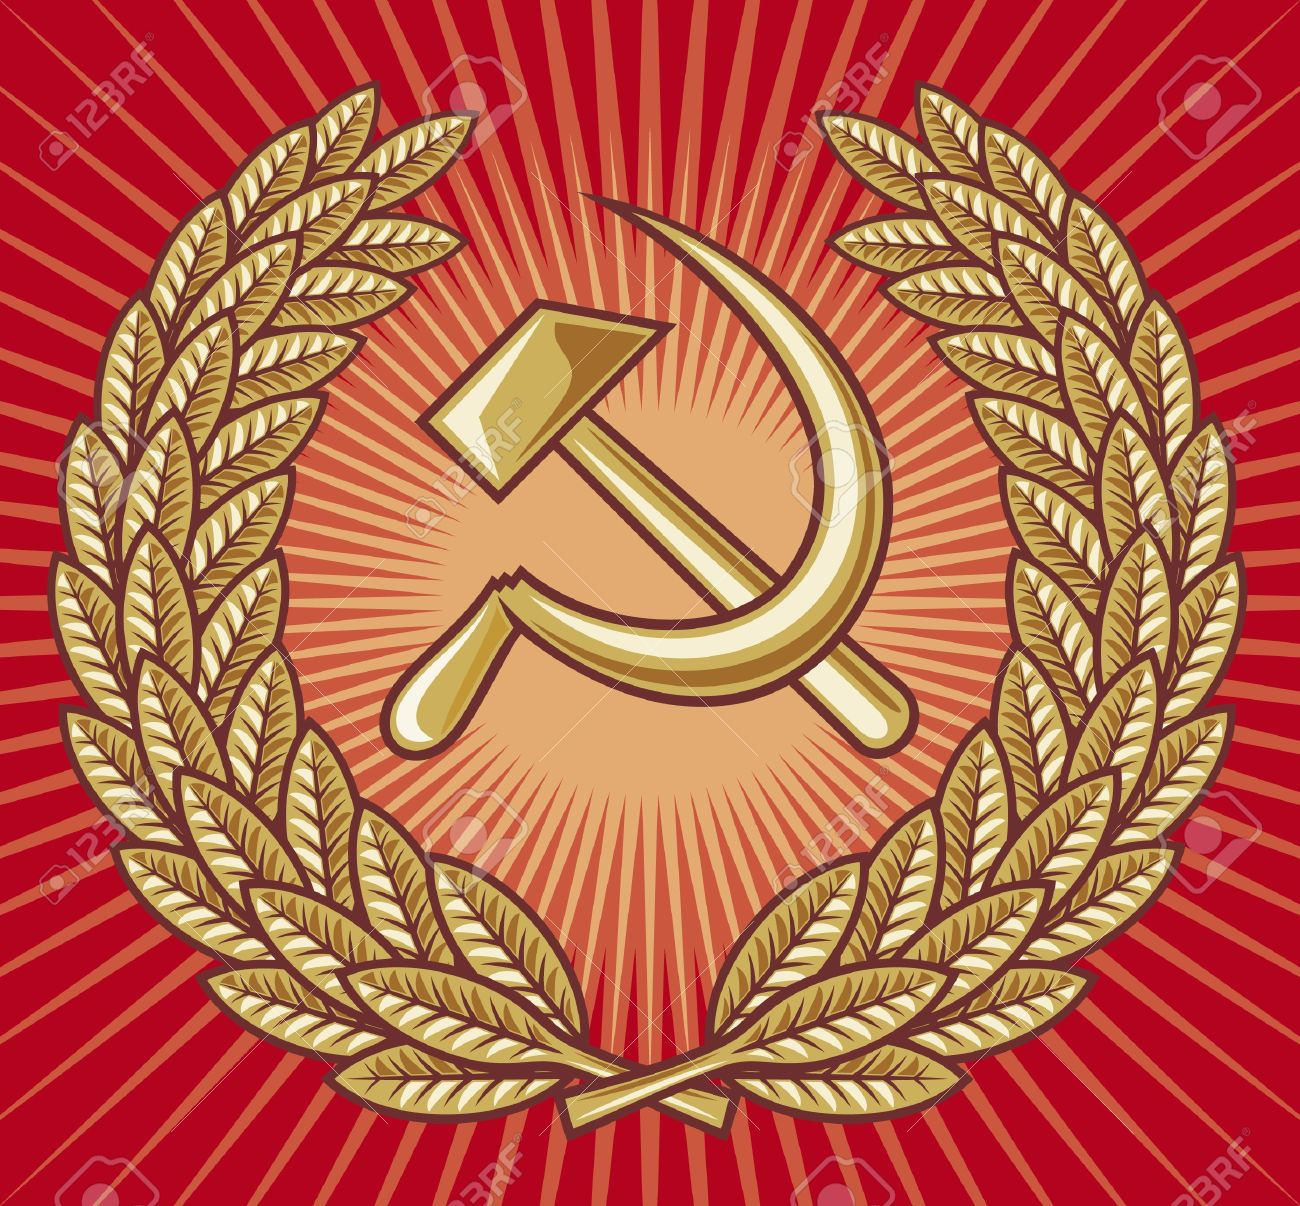 Symbol of ussr hammer sickle and laurel wreath ussr sign symbol of ussr hammer sickle and laurel wreath ussr sign soviet symbol biocorpaavc Gallery